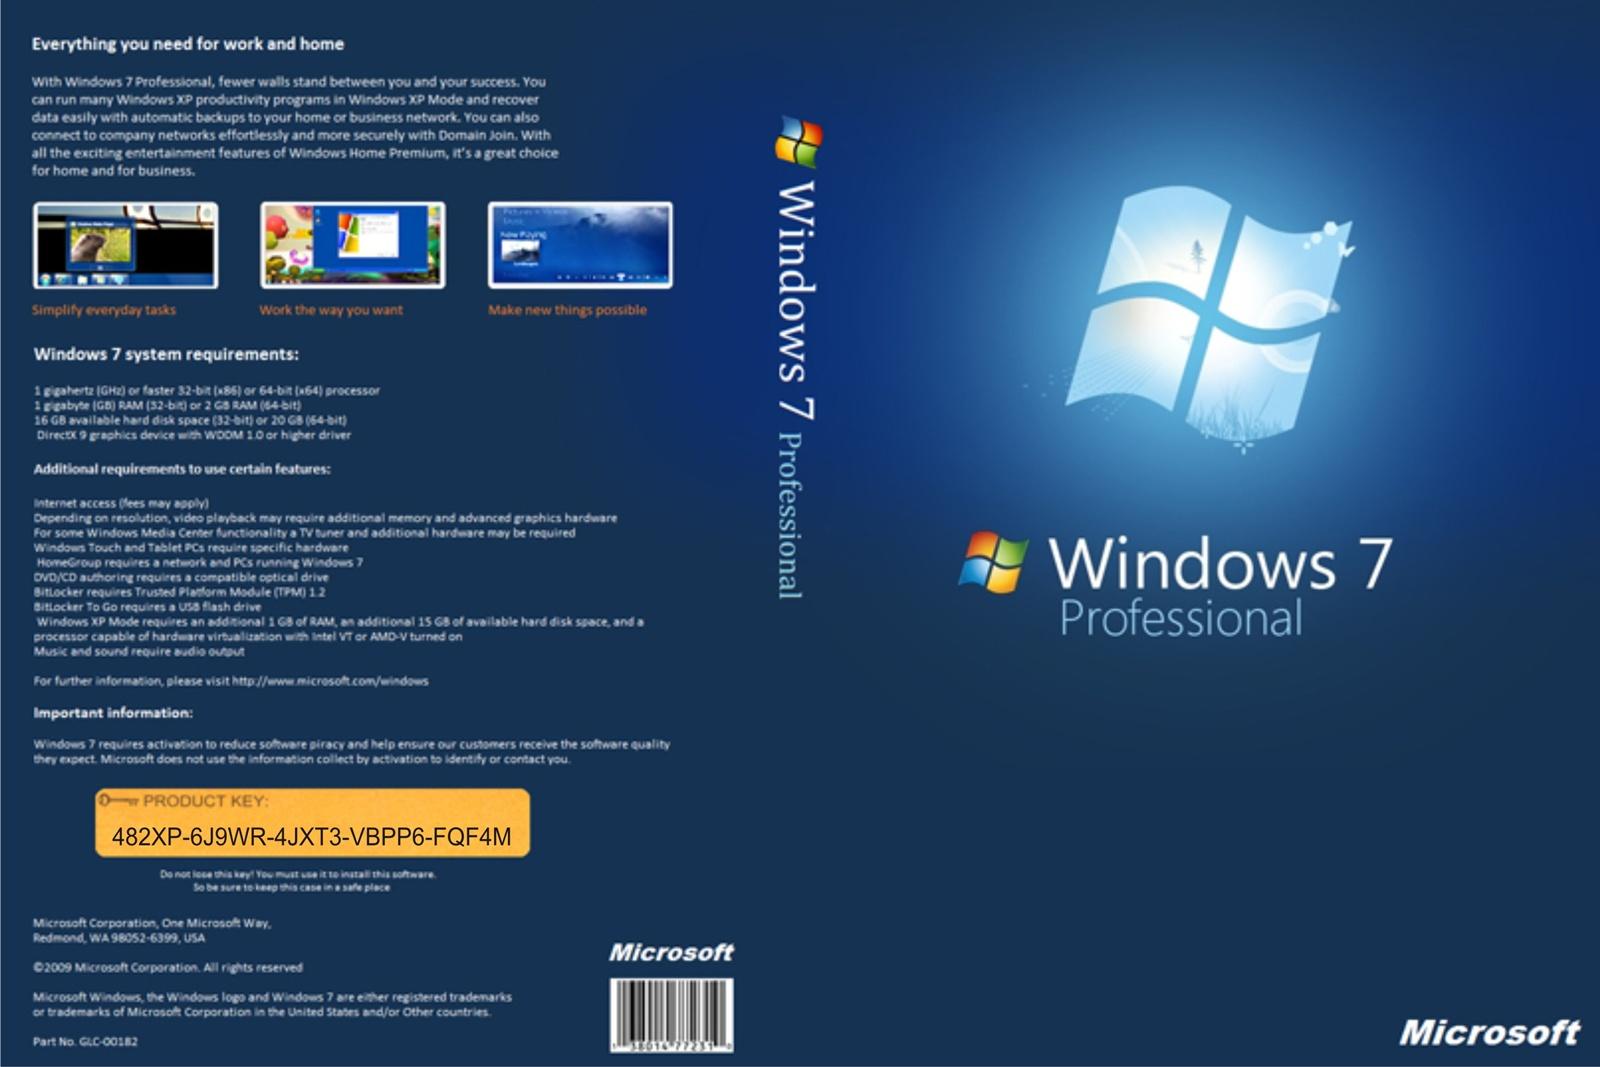 Download Microsoft Windows 7 Pro SP1 x86 PT-BR Windows 7 Professional 32bits